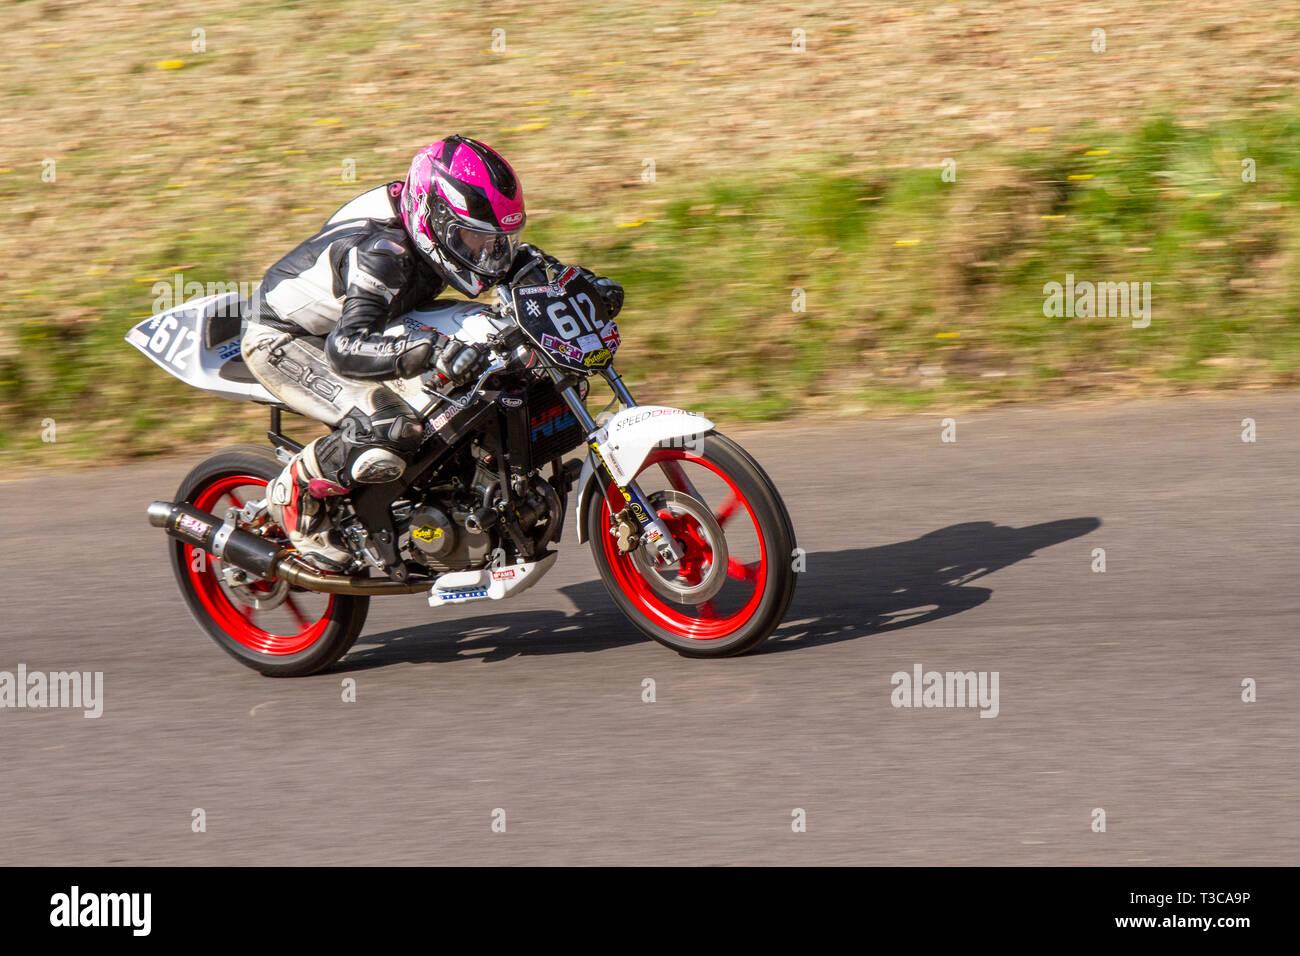 hight resolution of chorley lancashire uk april 2019 hoghton tower 43rd motorcycle sprint